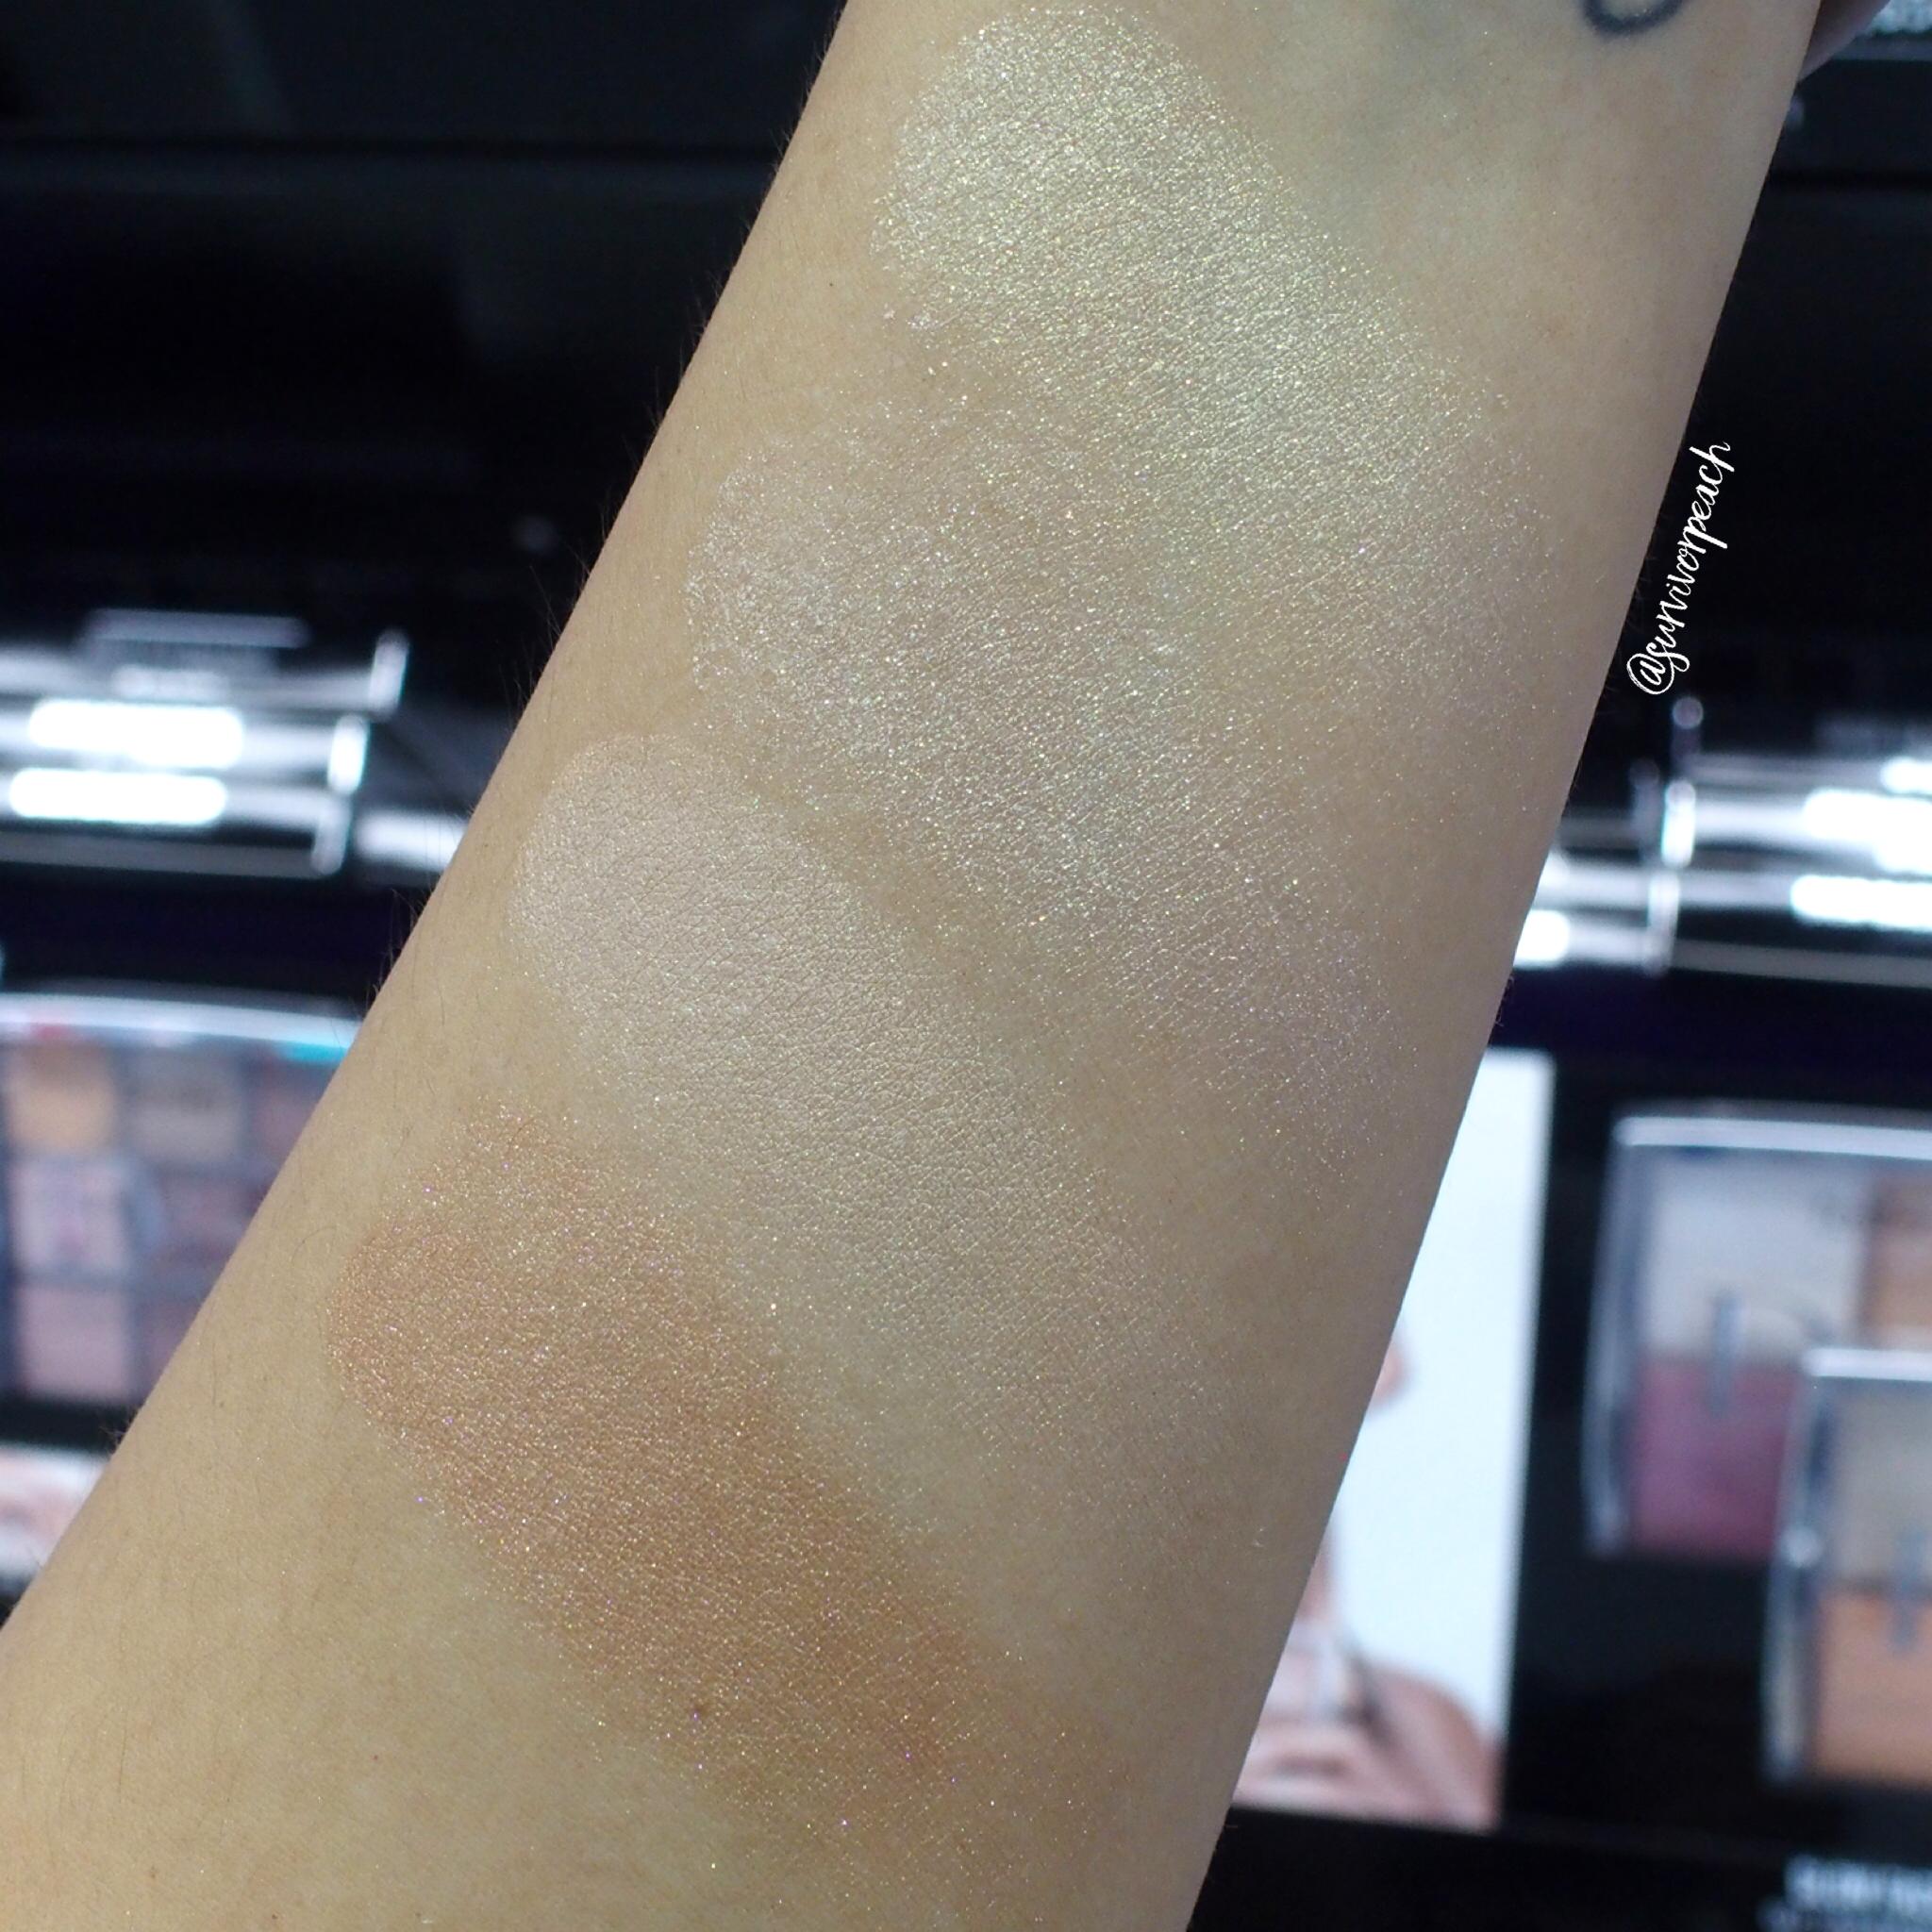 Dior Backstage Glow Face Palette 002 Glitz swatches